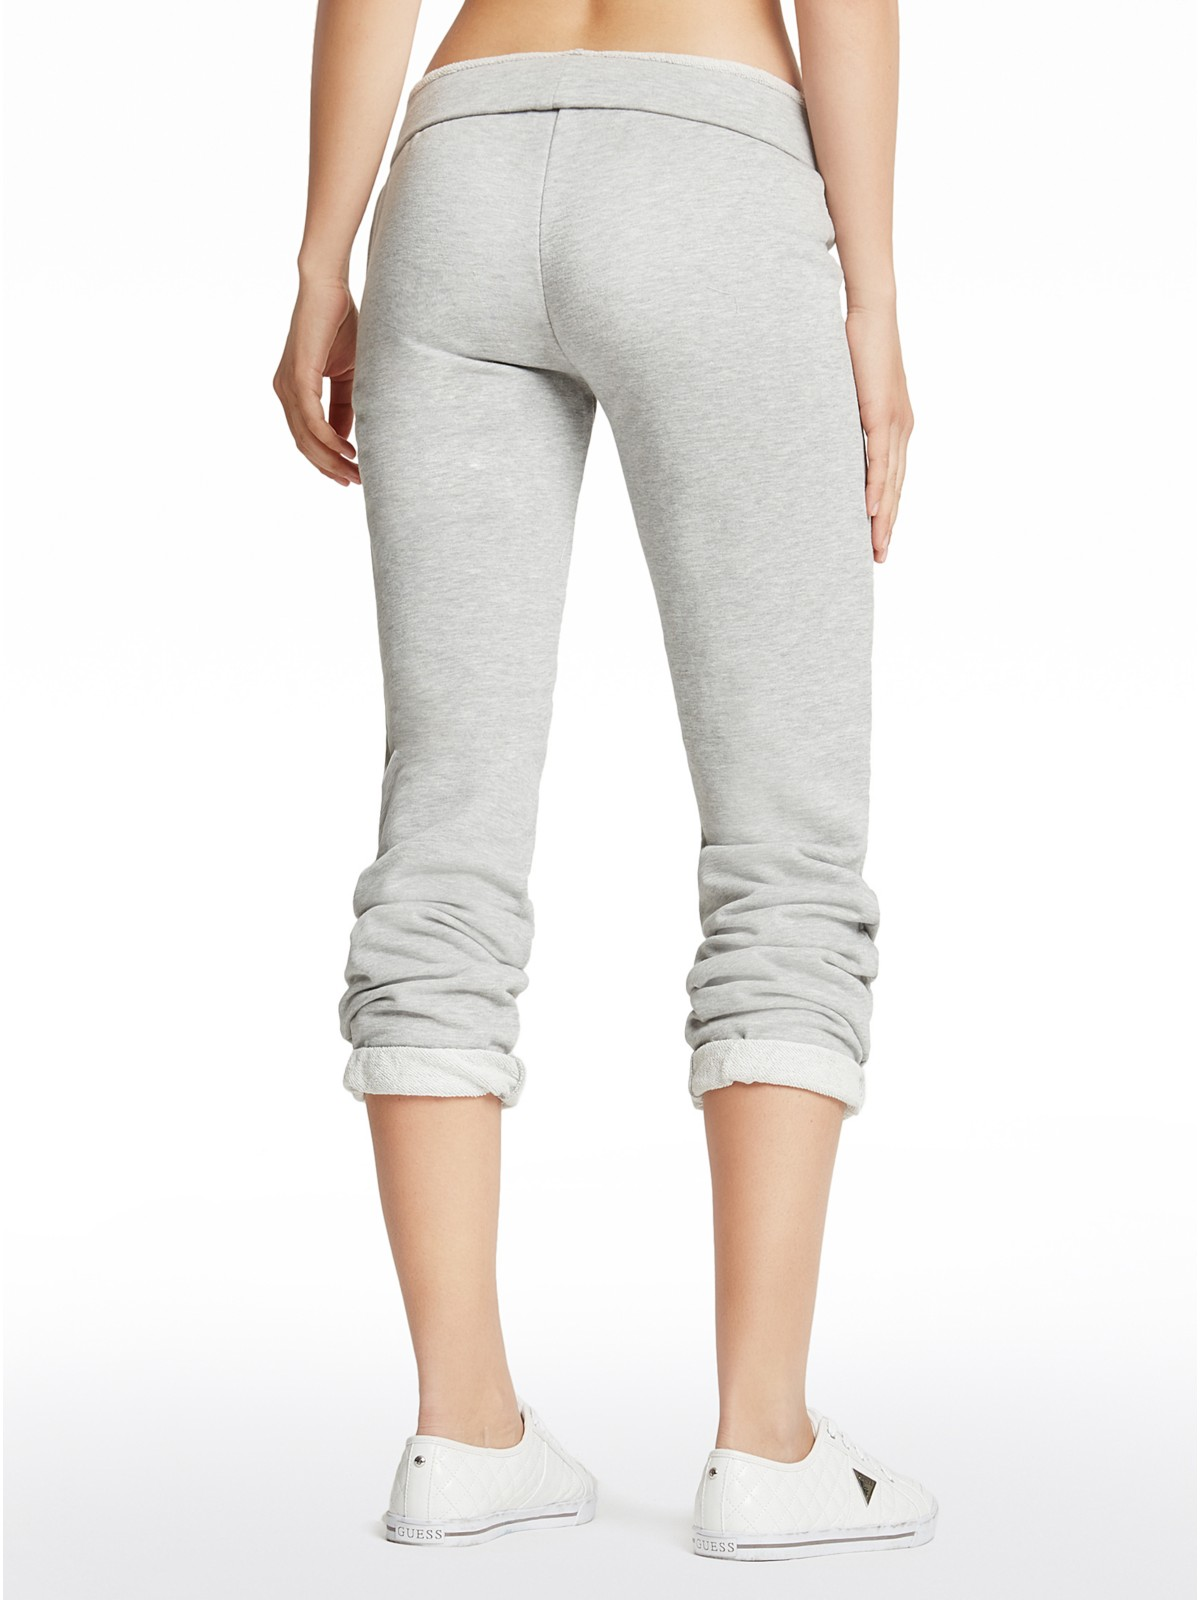 GUESS Women's Milla Boyfriend Sweatpants